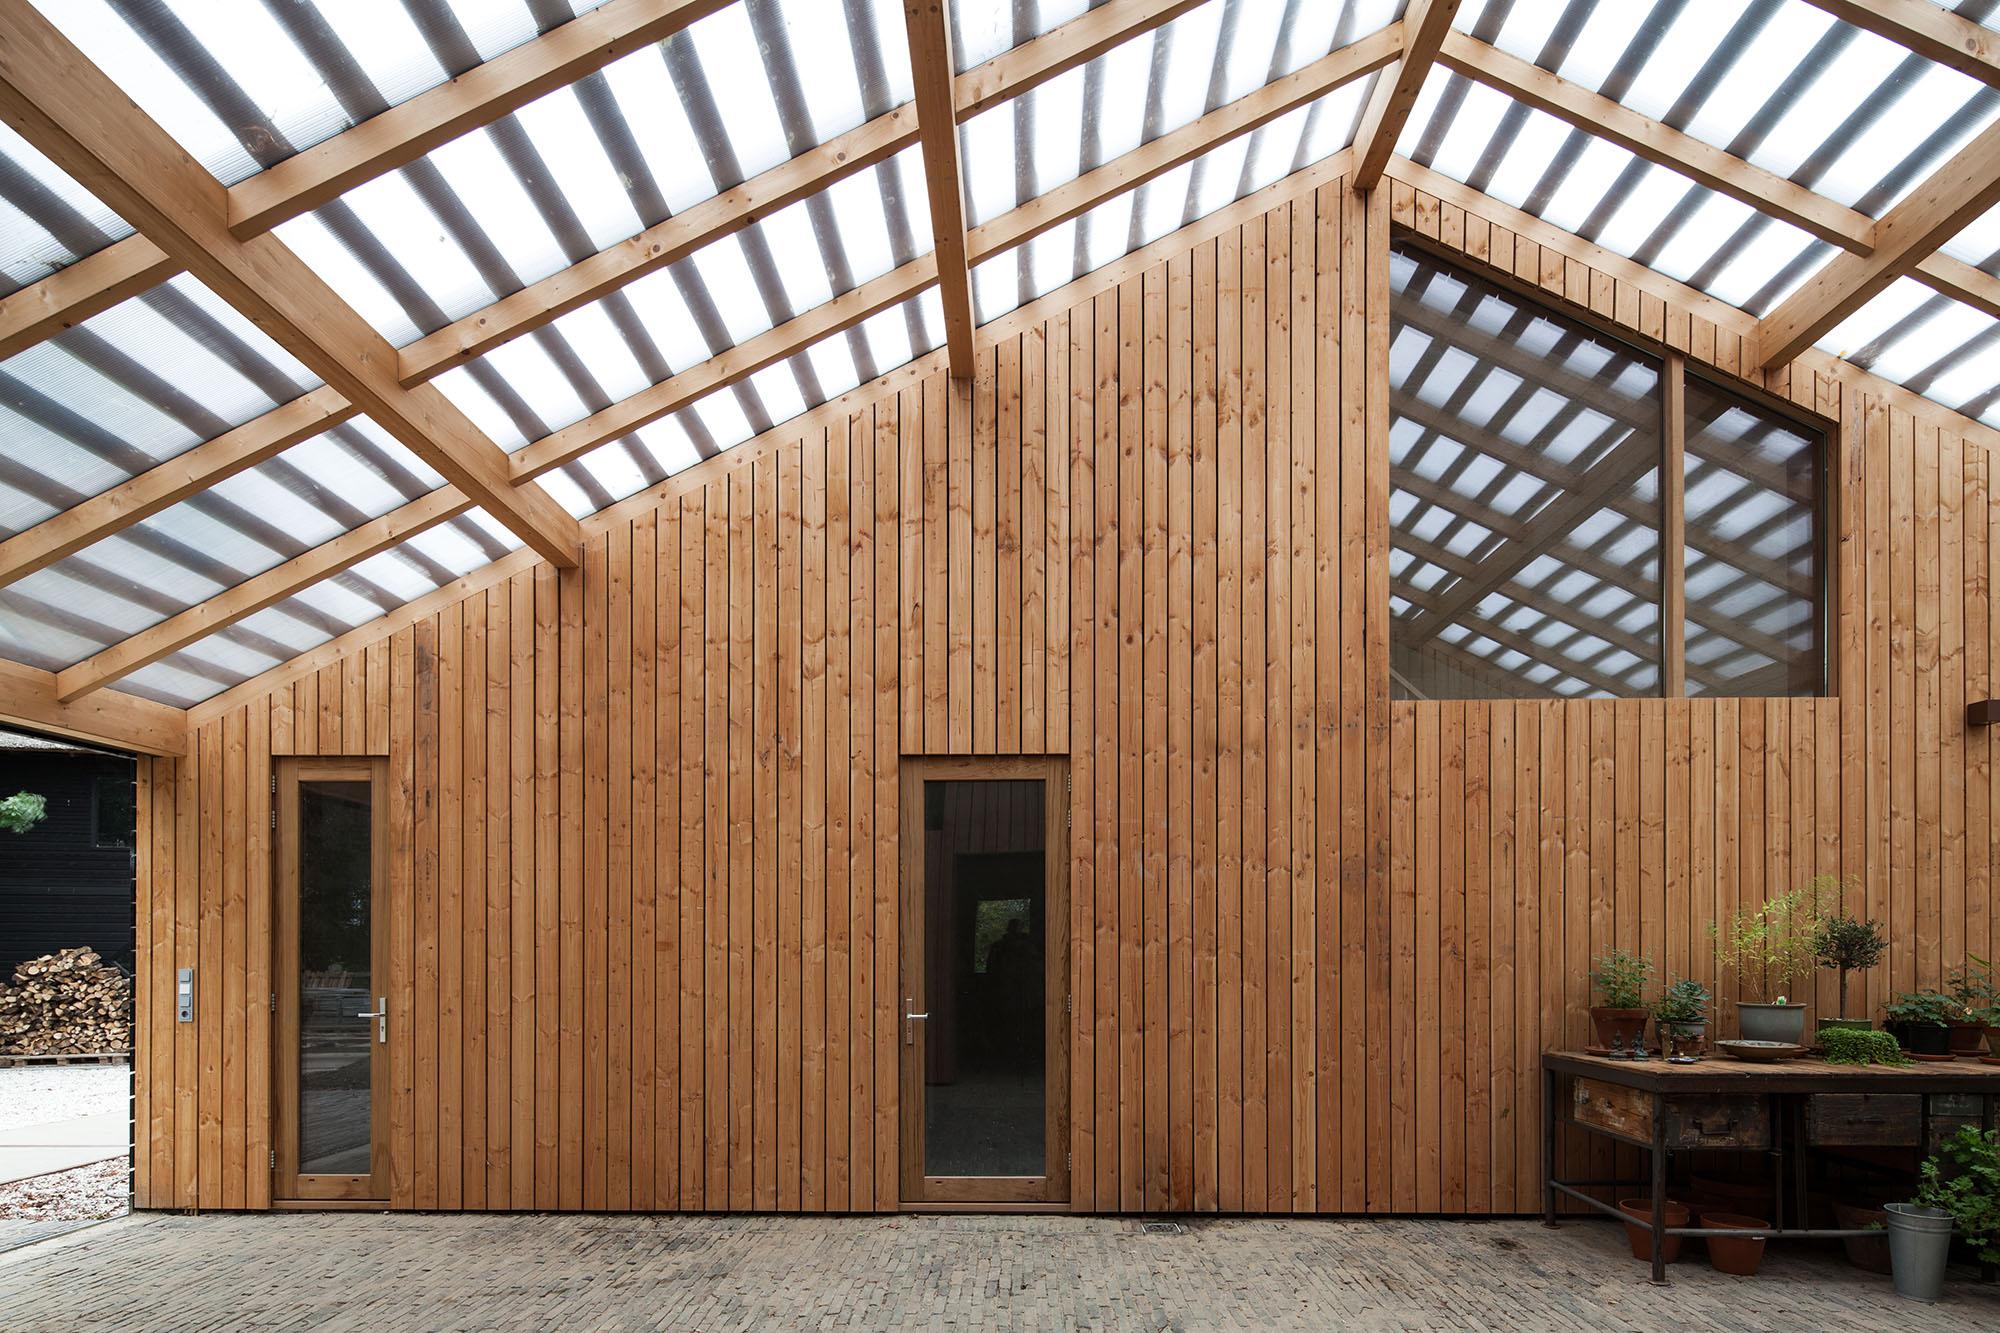 <p>fotografie: Workshop architecten</p>